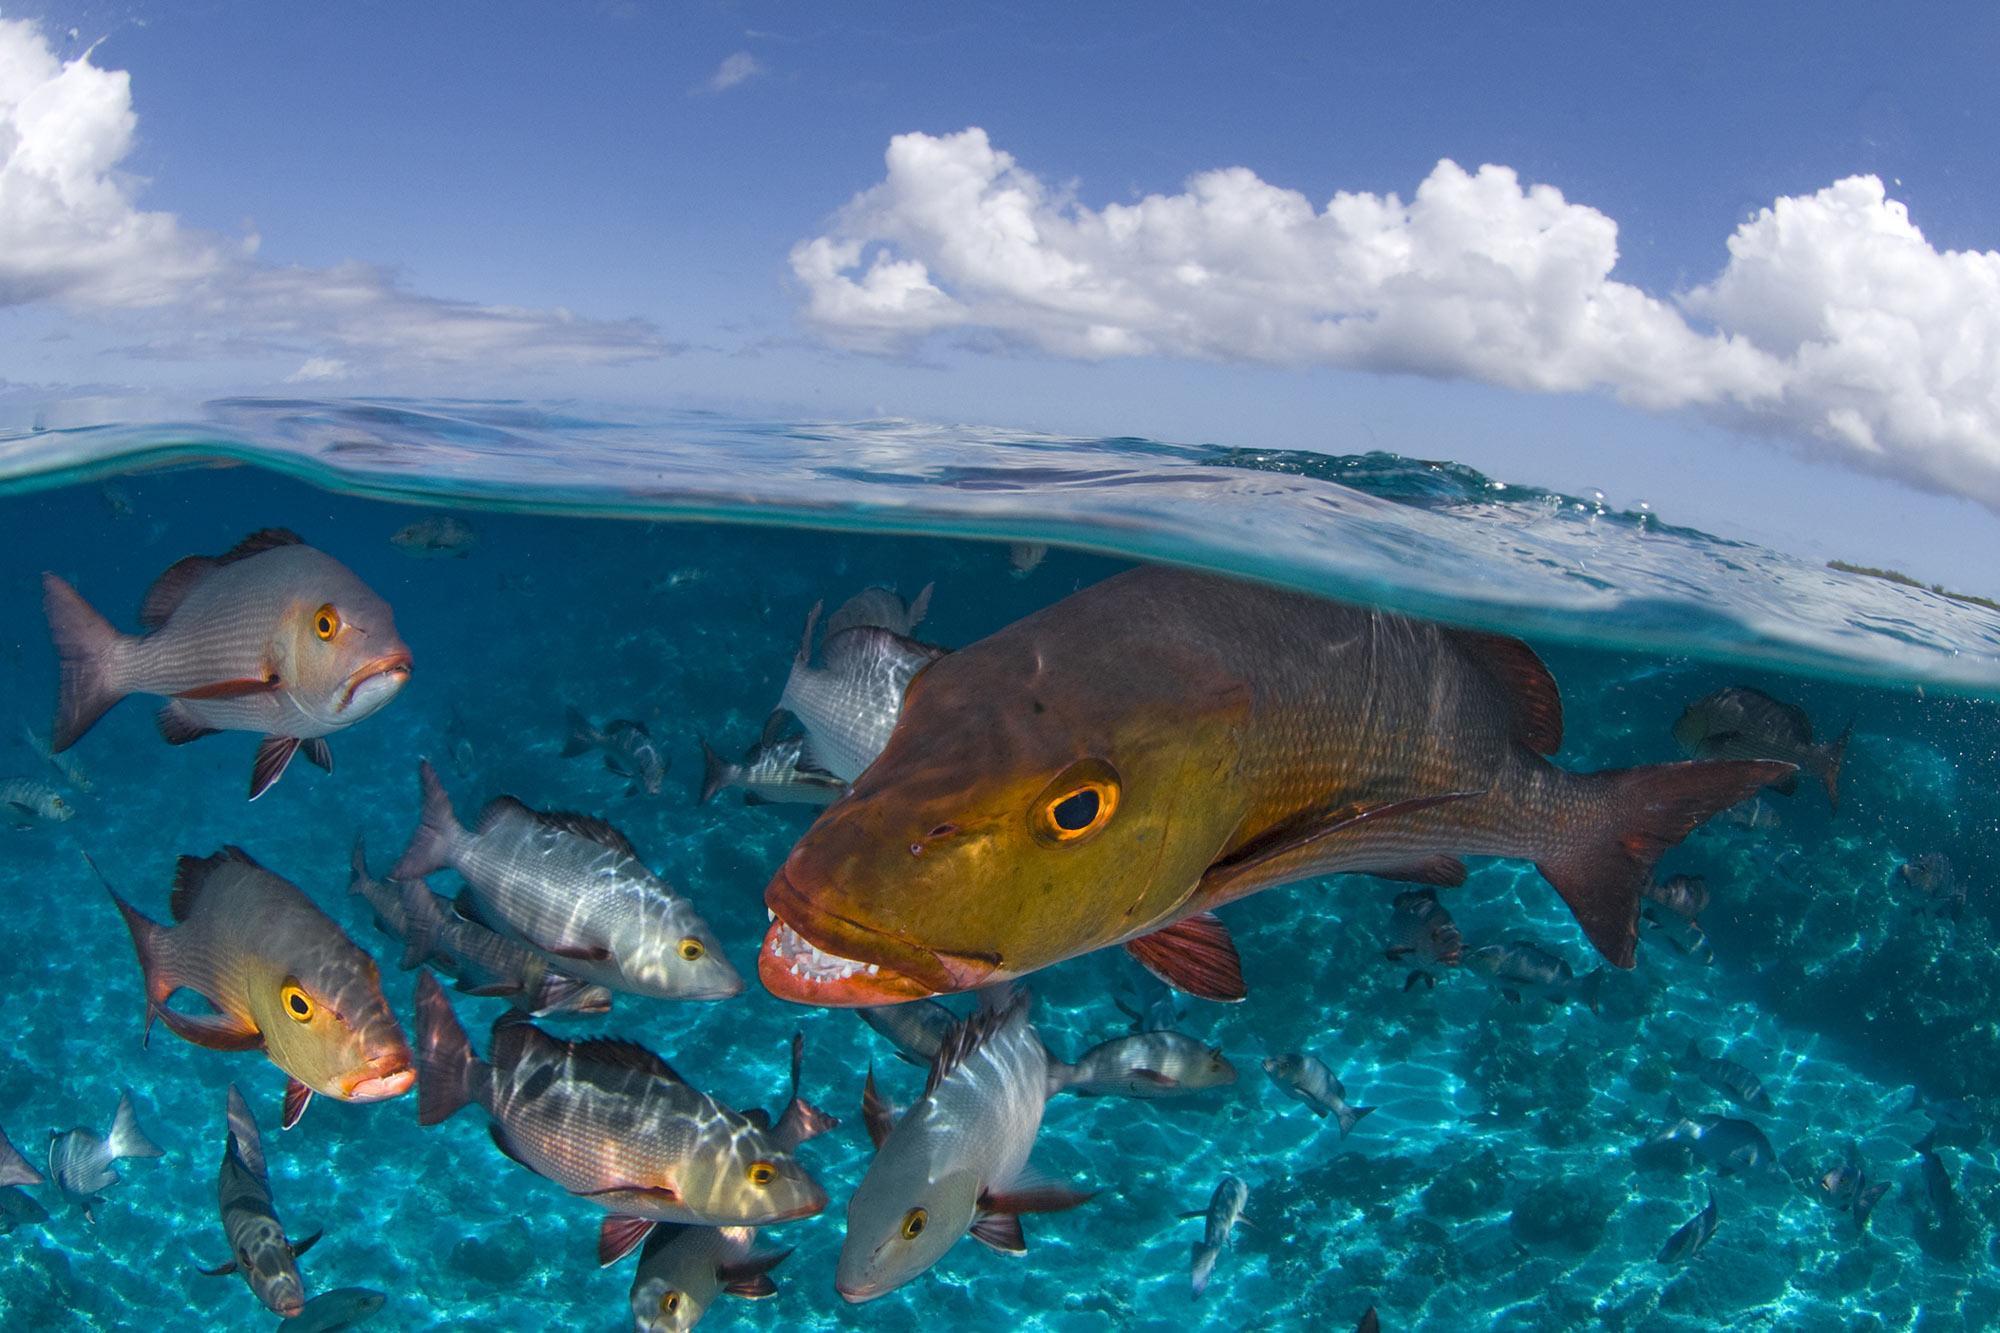 Fish swimming in clean, plastic free water